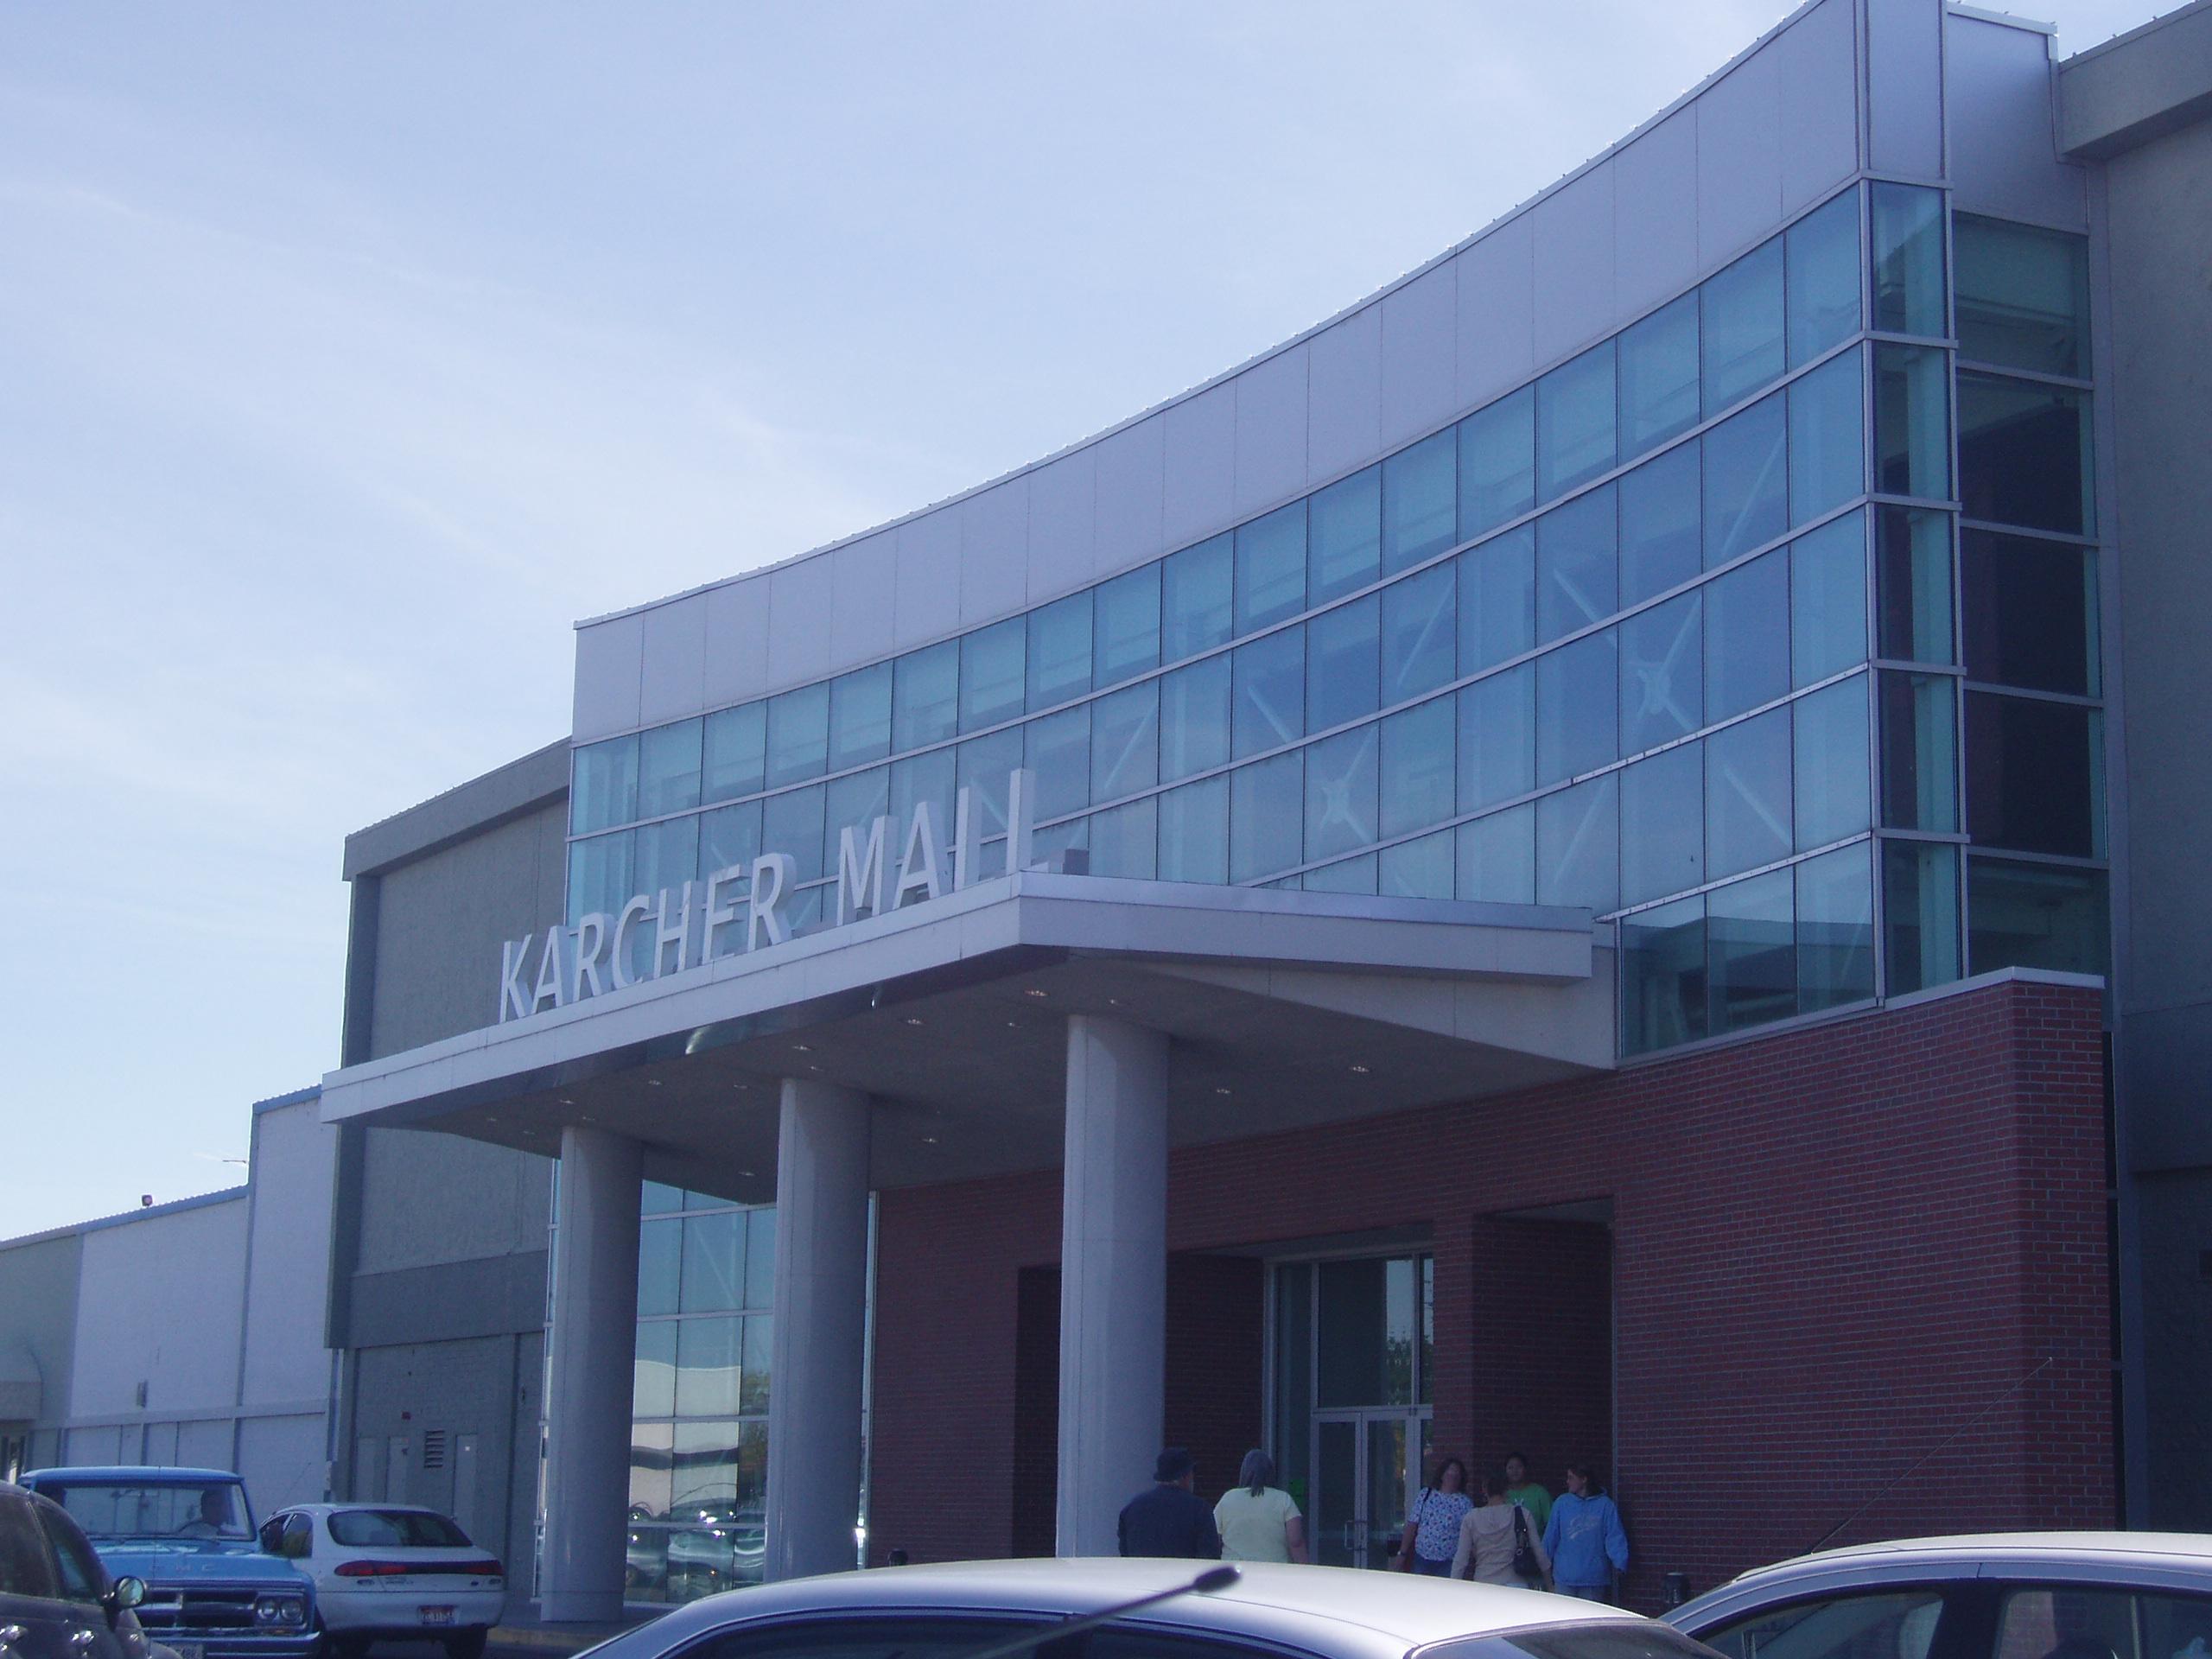 Karcher Mall Wikipedia